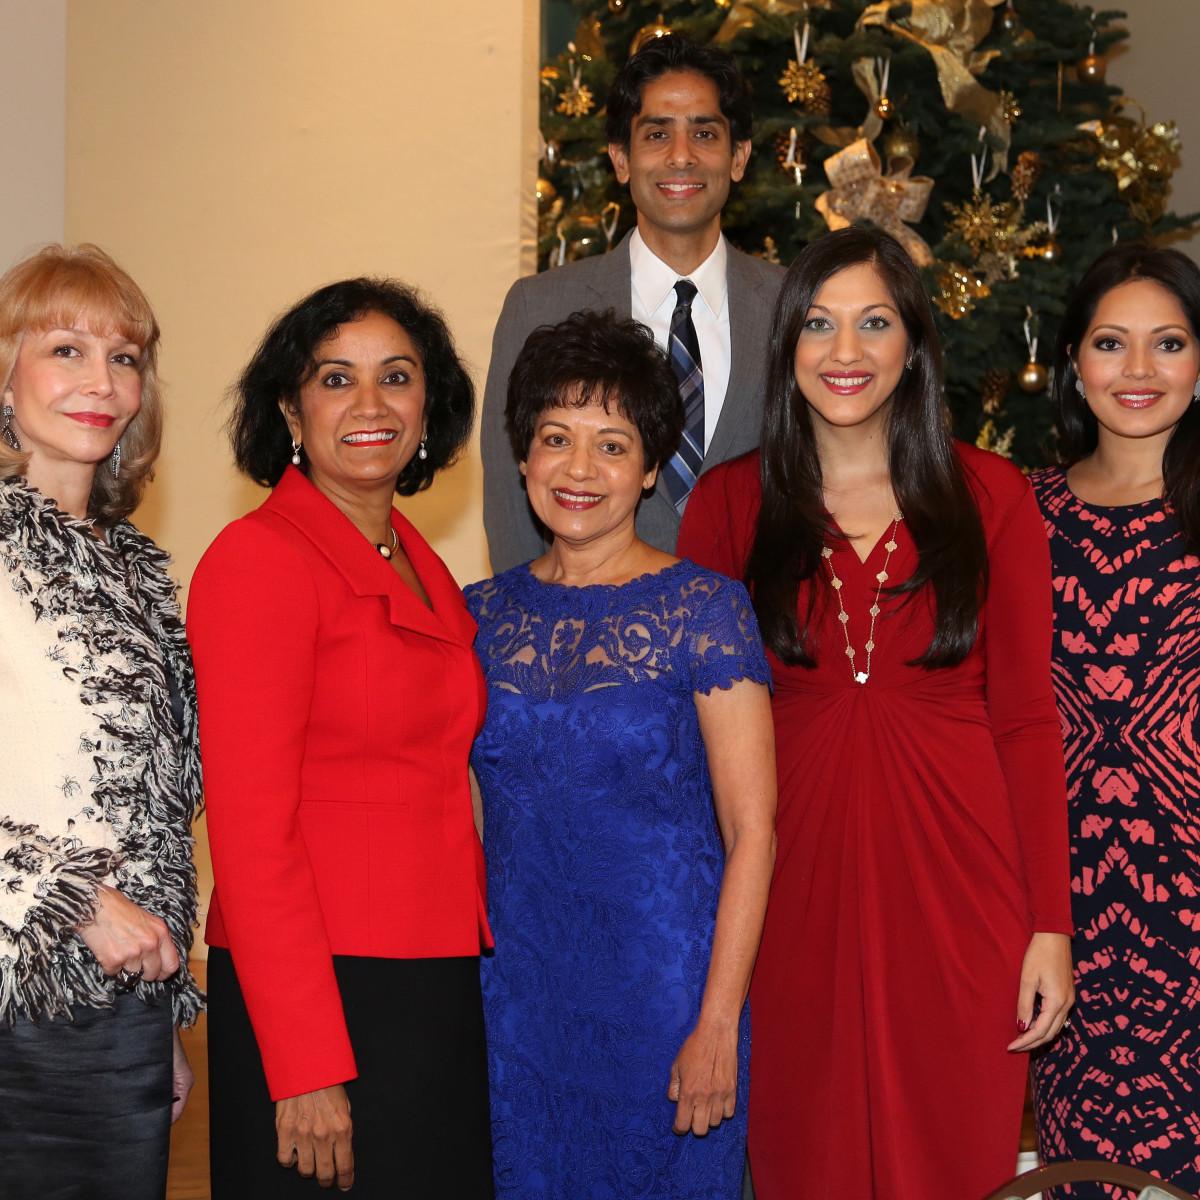 Pratham Holiday Party Susan Boggio, Annu Naik, Dr. Marie Goradia, Dr. Sippi Khurana, and Dr. Sandeep Shah.